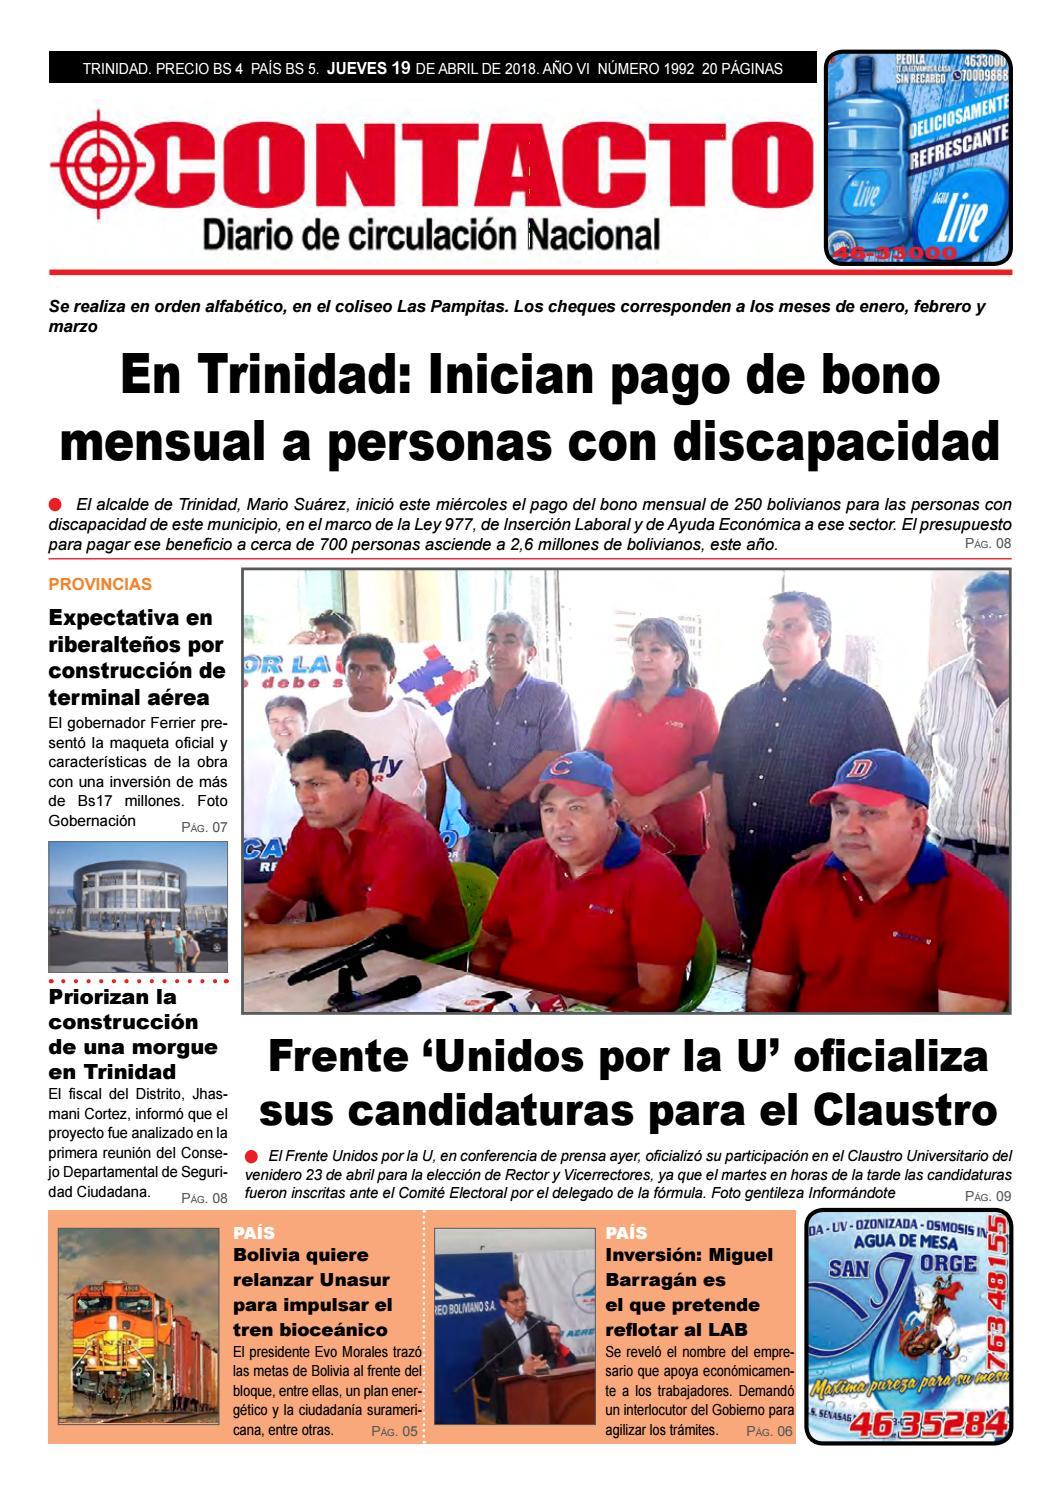 Contacto19042018 by Diario Contacto (Beni - Bolivia) - issuu